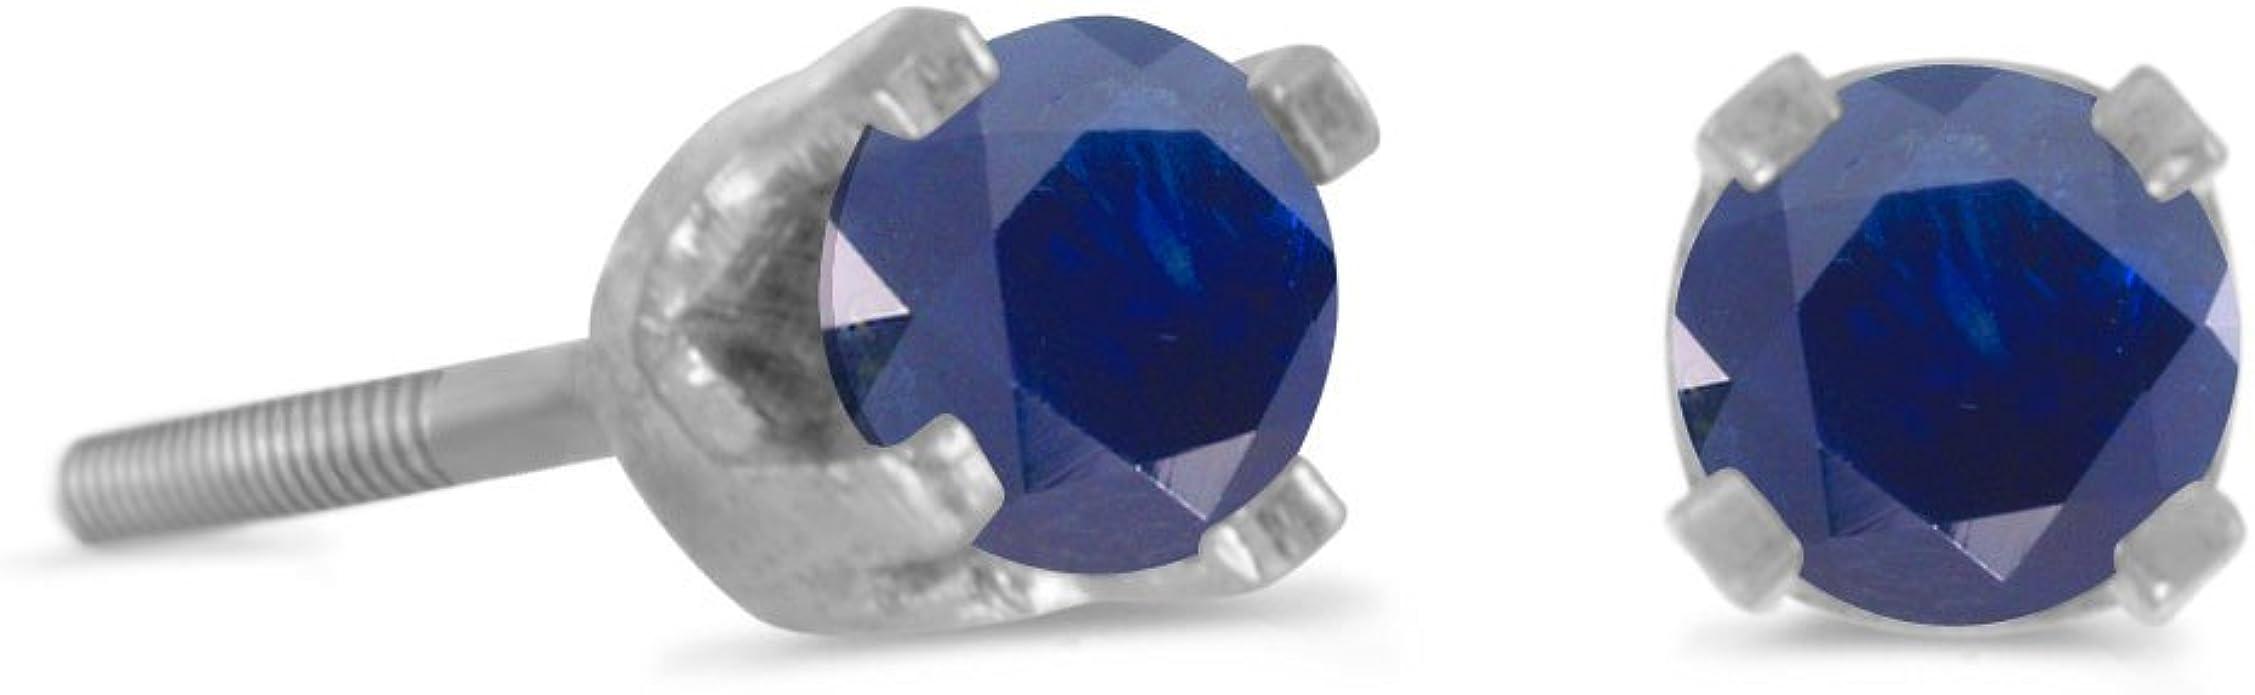 6mm HEART BLUE SAPPHIRE SCREW BACK EARRINGS 14K W GOLD BABY-ADULT /& CHILD 3mm